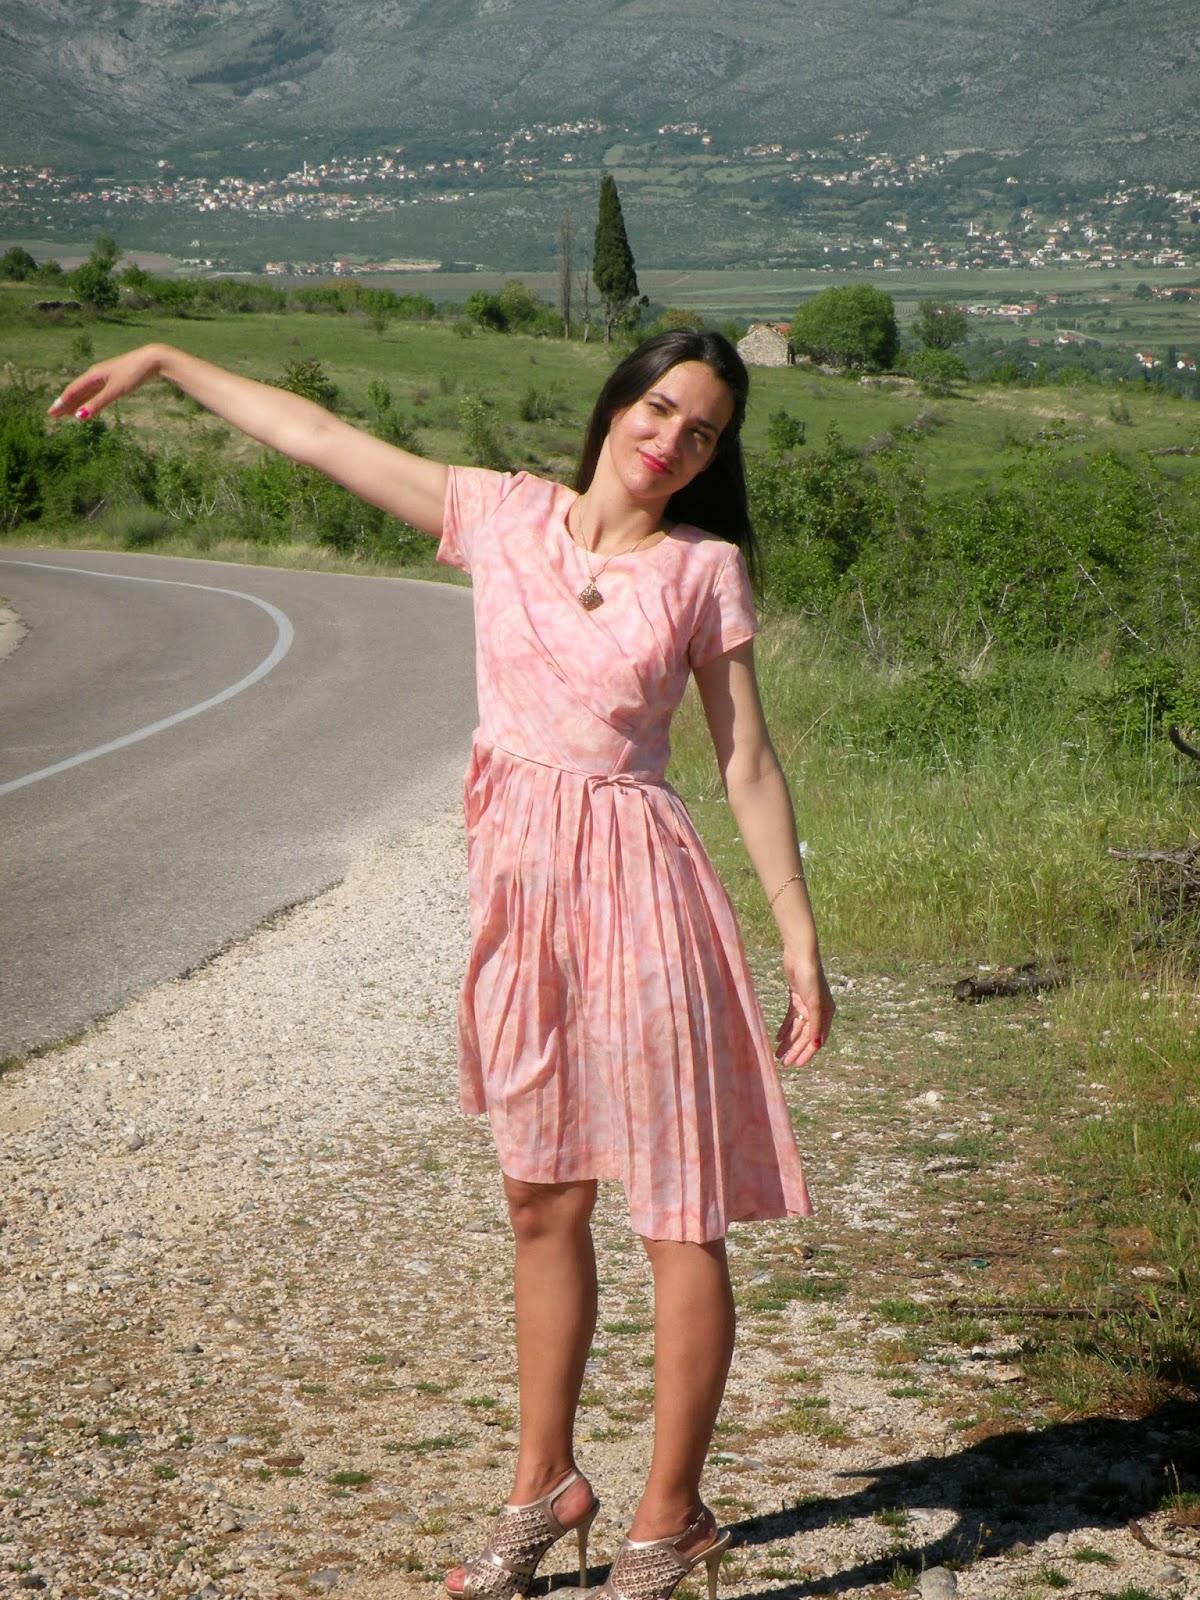 https://modaodaradosti.blogspot.com/2015/05/the-story-of-dress-outfit-post-prica-o.html